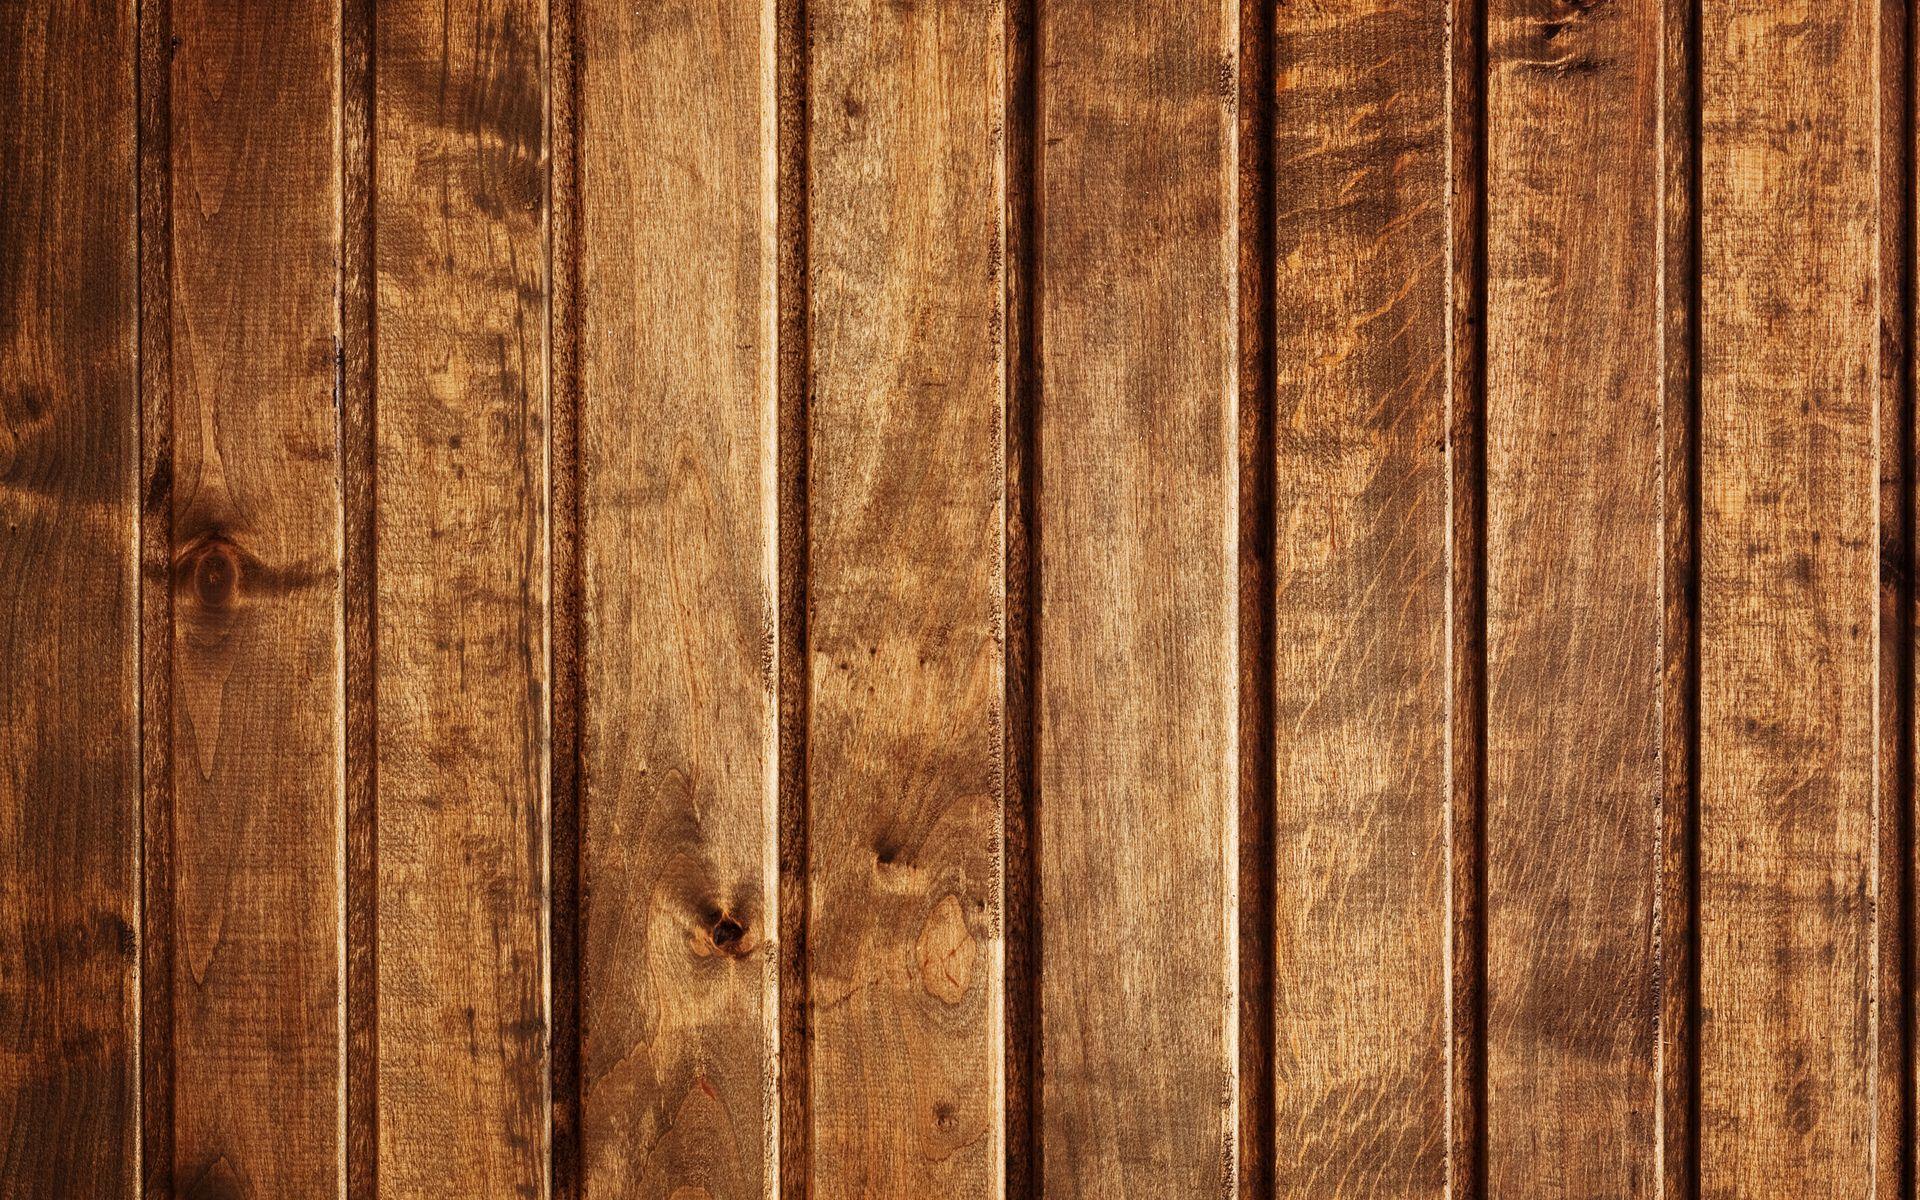 Wood pattern wallpaper x wallpaperup hd wallpapers pinterest wood pattern wallpaper x wallpaperup voltagebd Choice Image